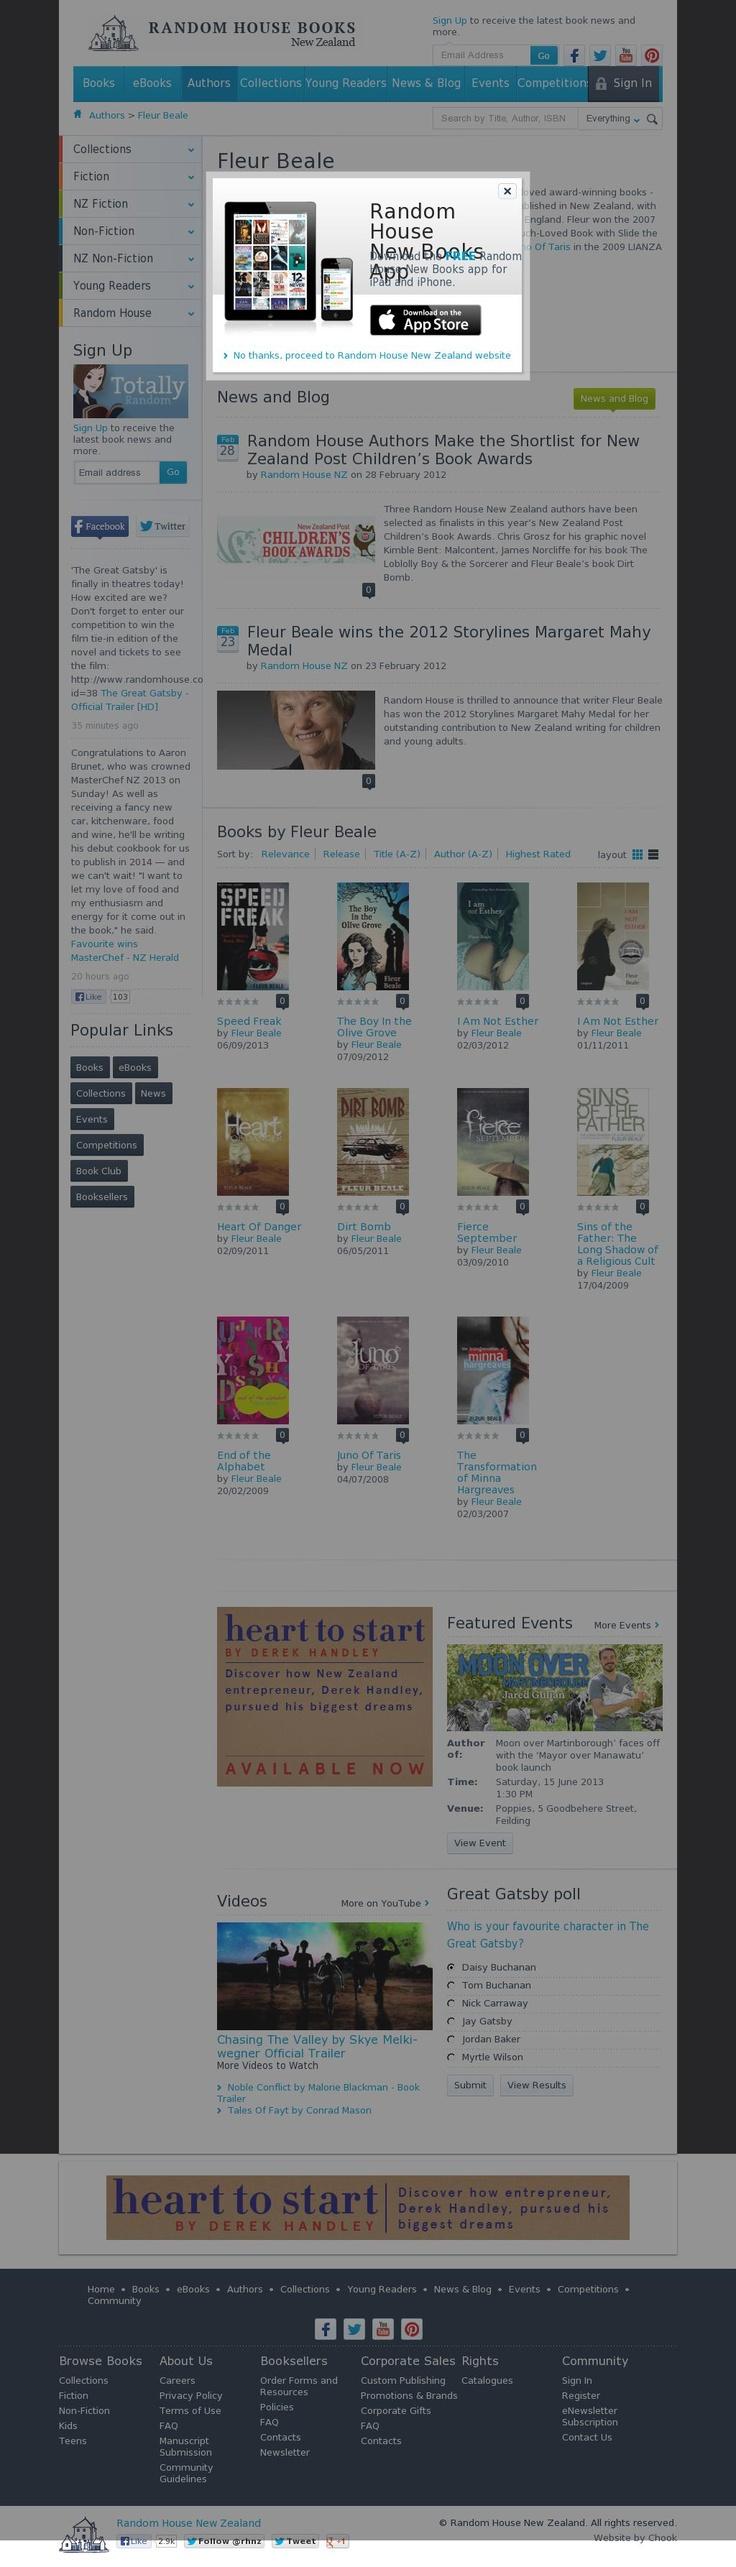 The website http://www.randomhouse.co.nz/authors/fleur-beale.aspx courtesy of @Pinstamatic (http://pinstamatic.com)